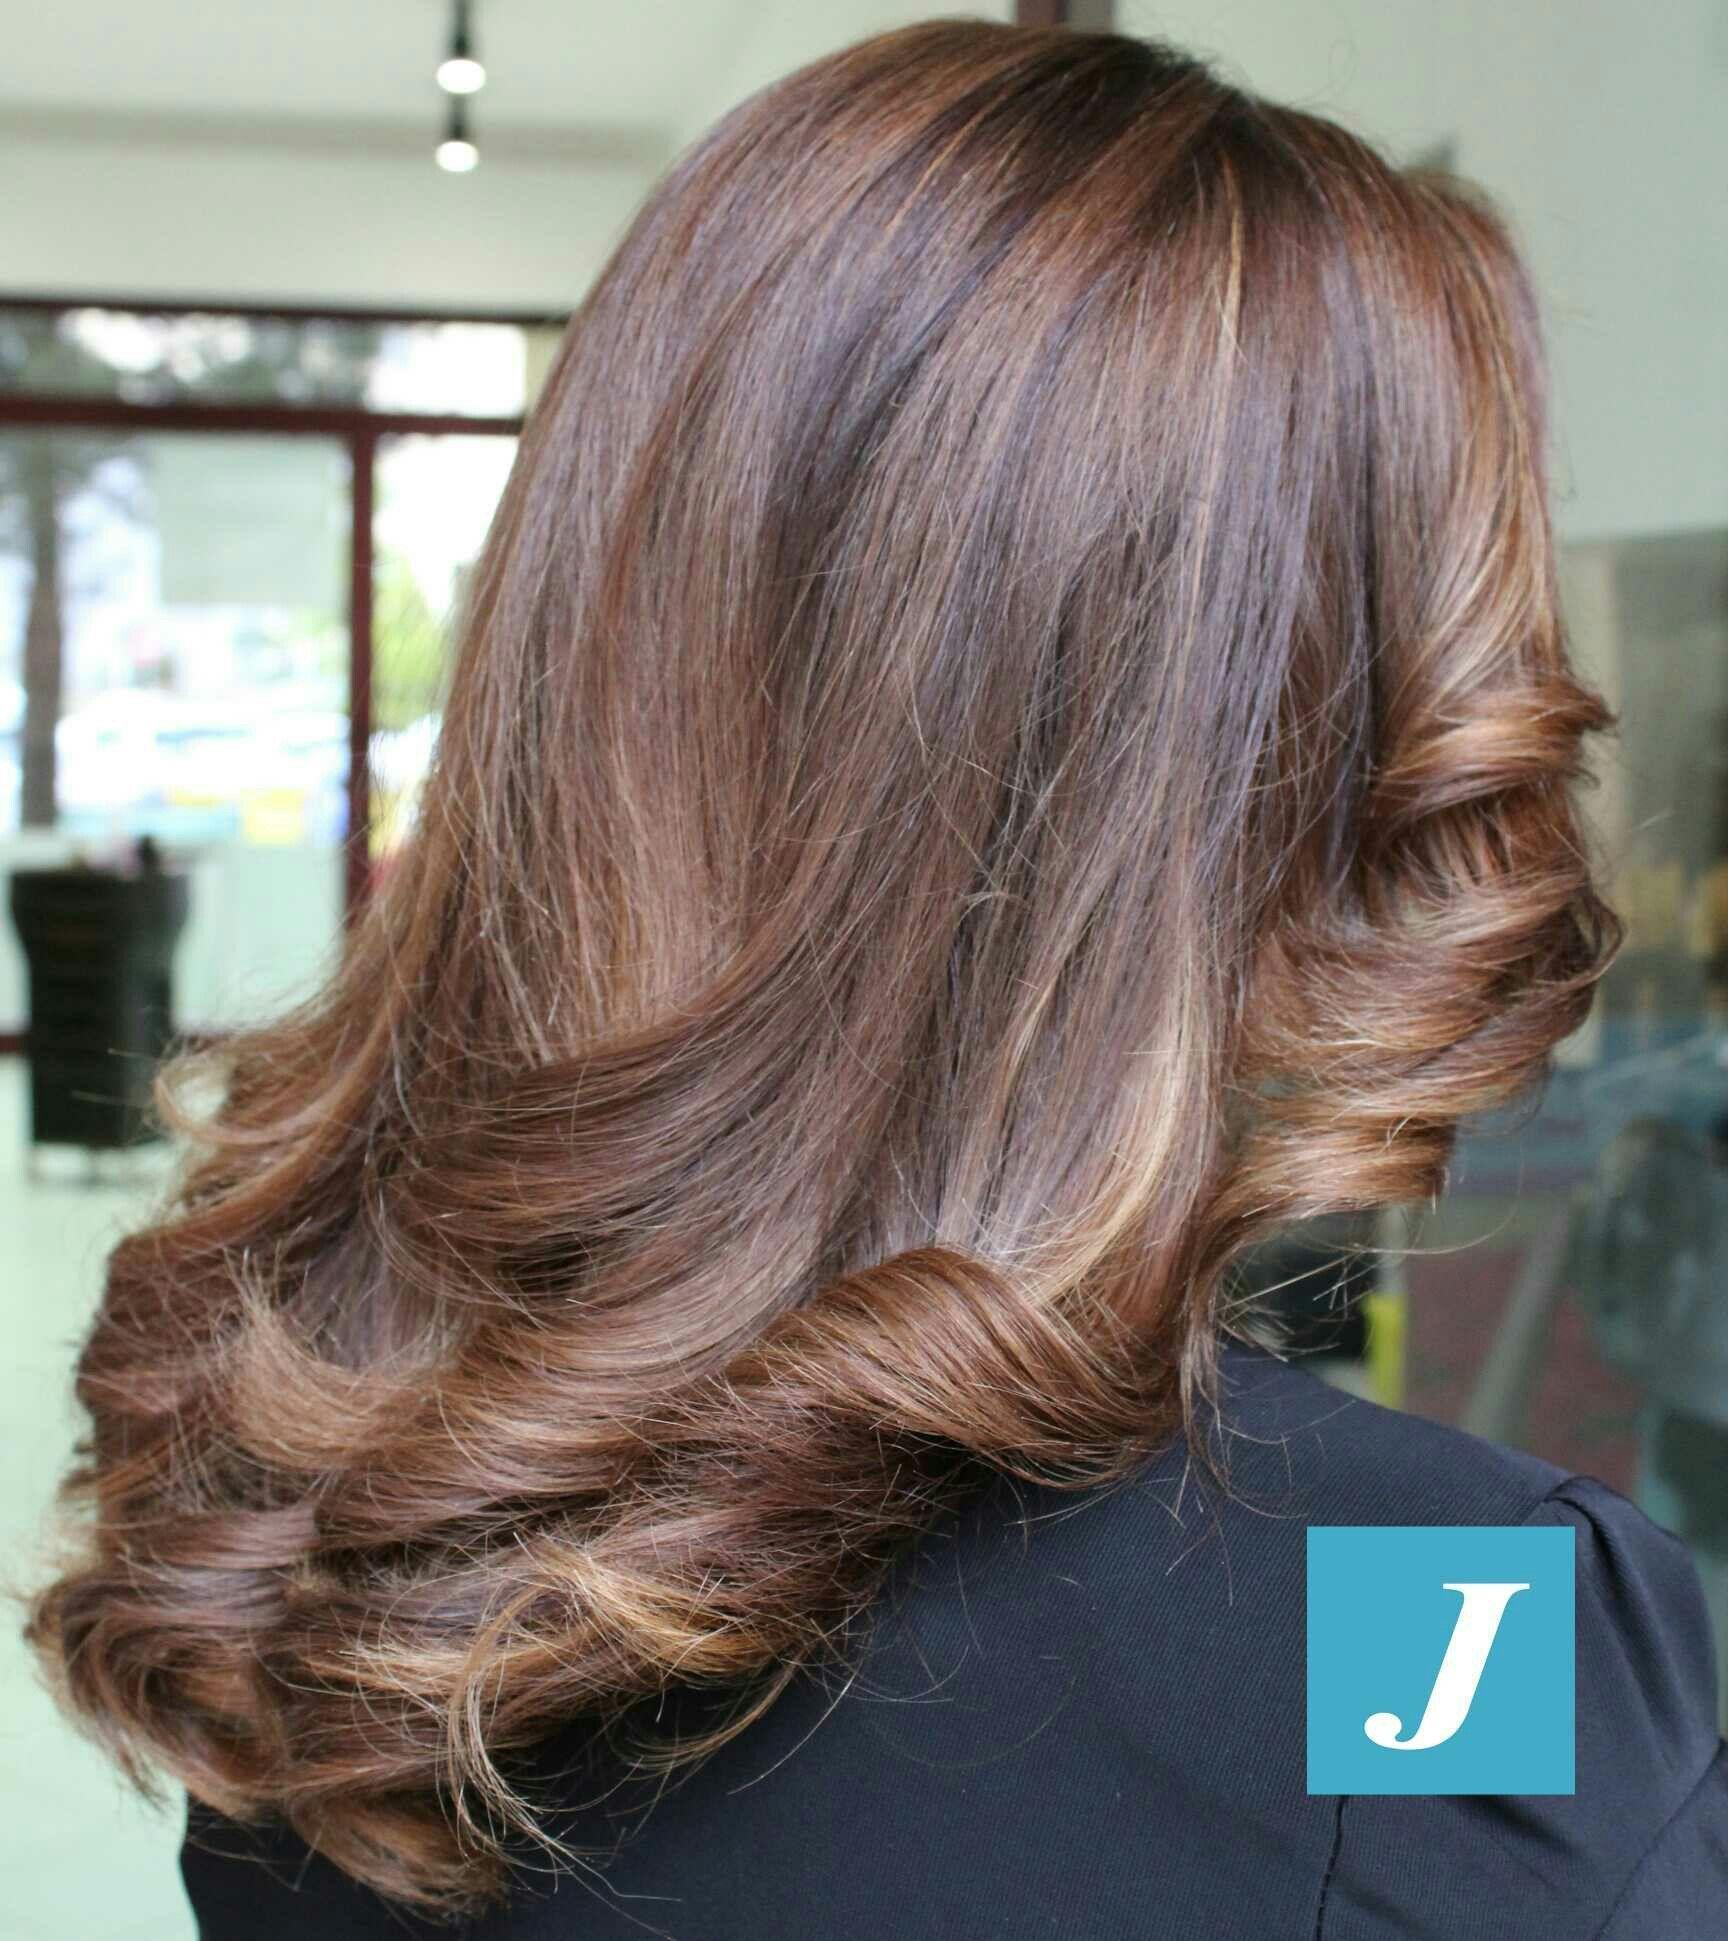 Layered EasyHairstyleTutorials Easy Hairstyle Tutorials in